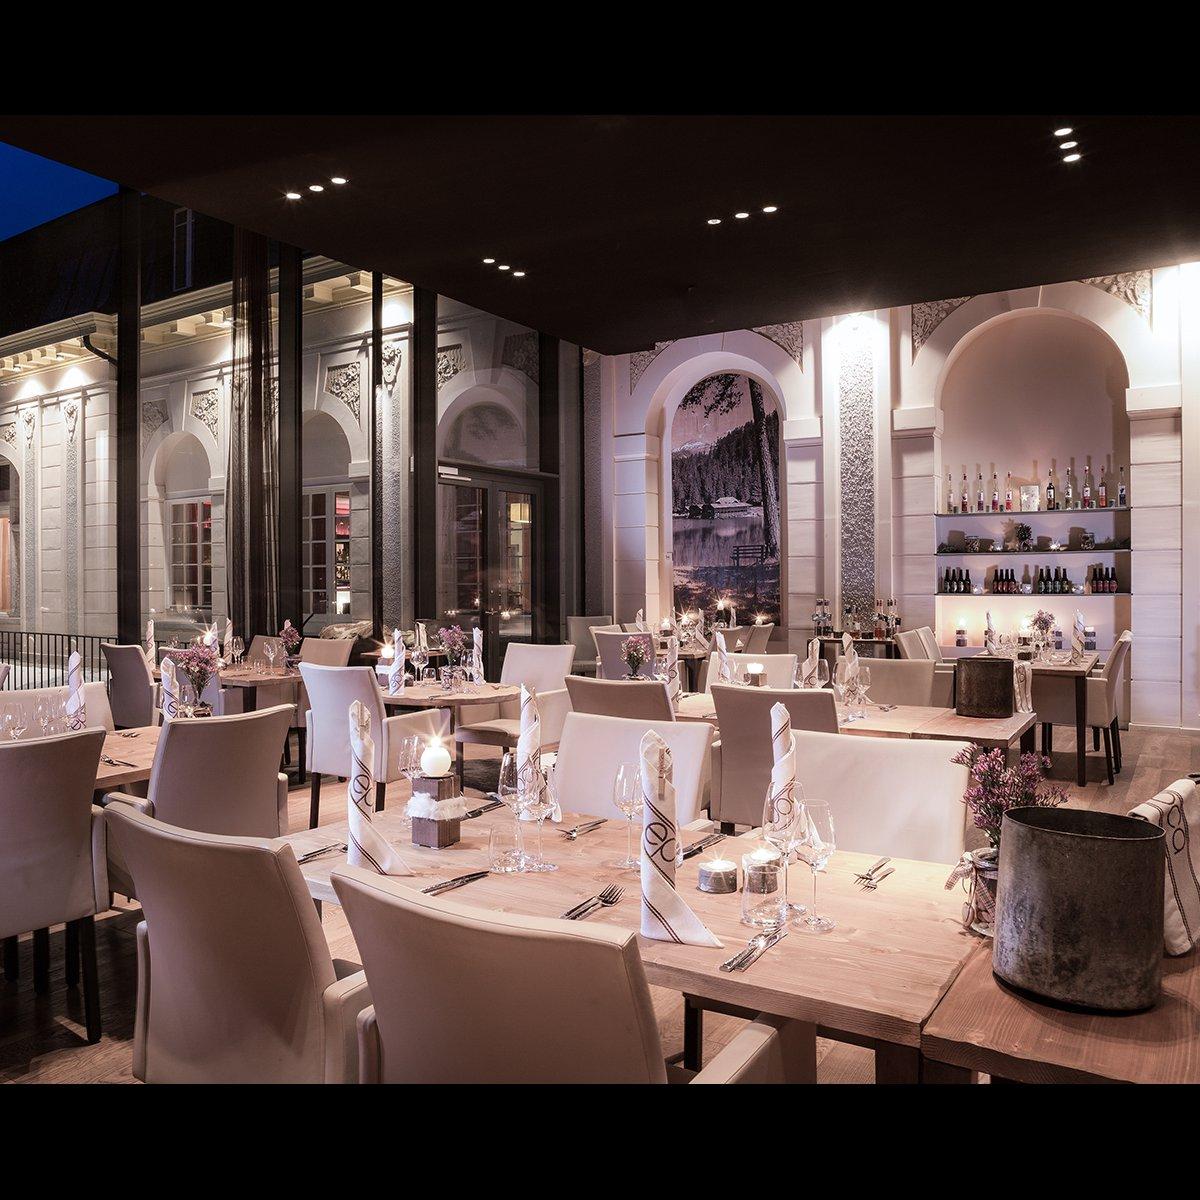 Restaurant Epoca Innen